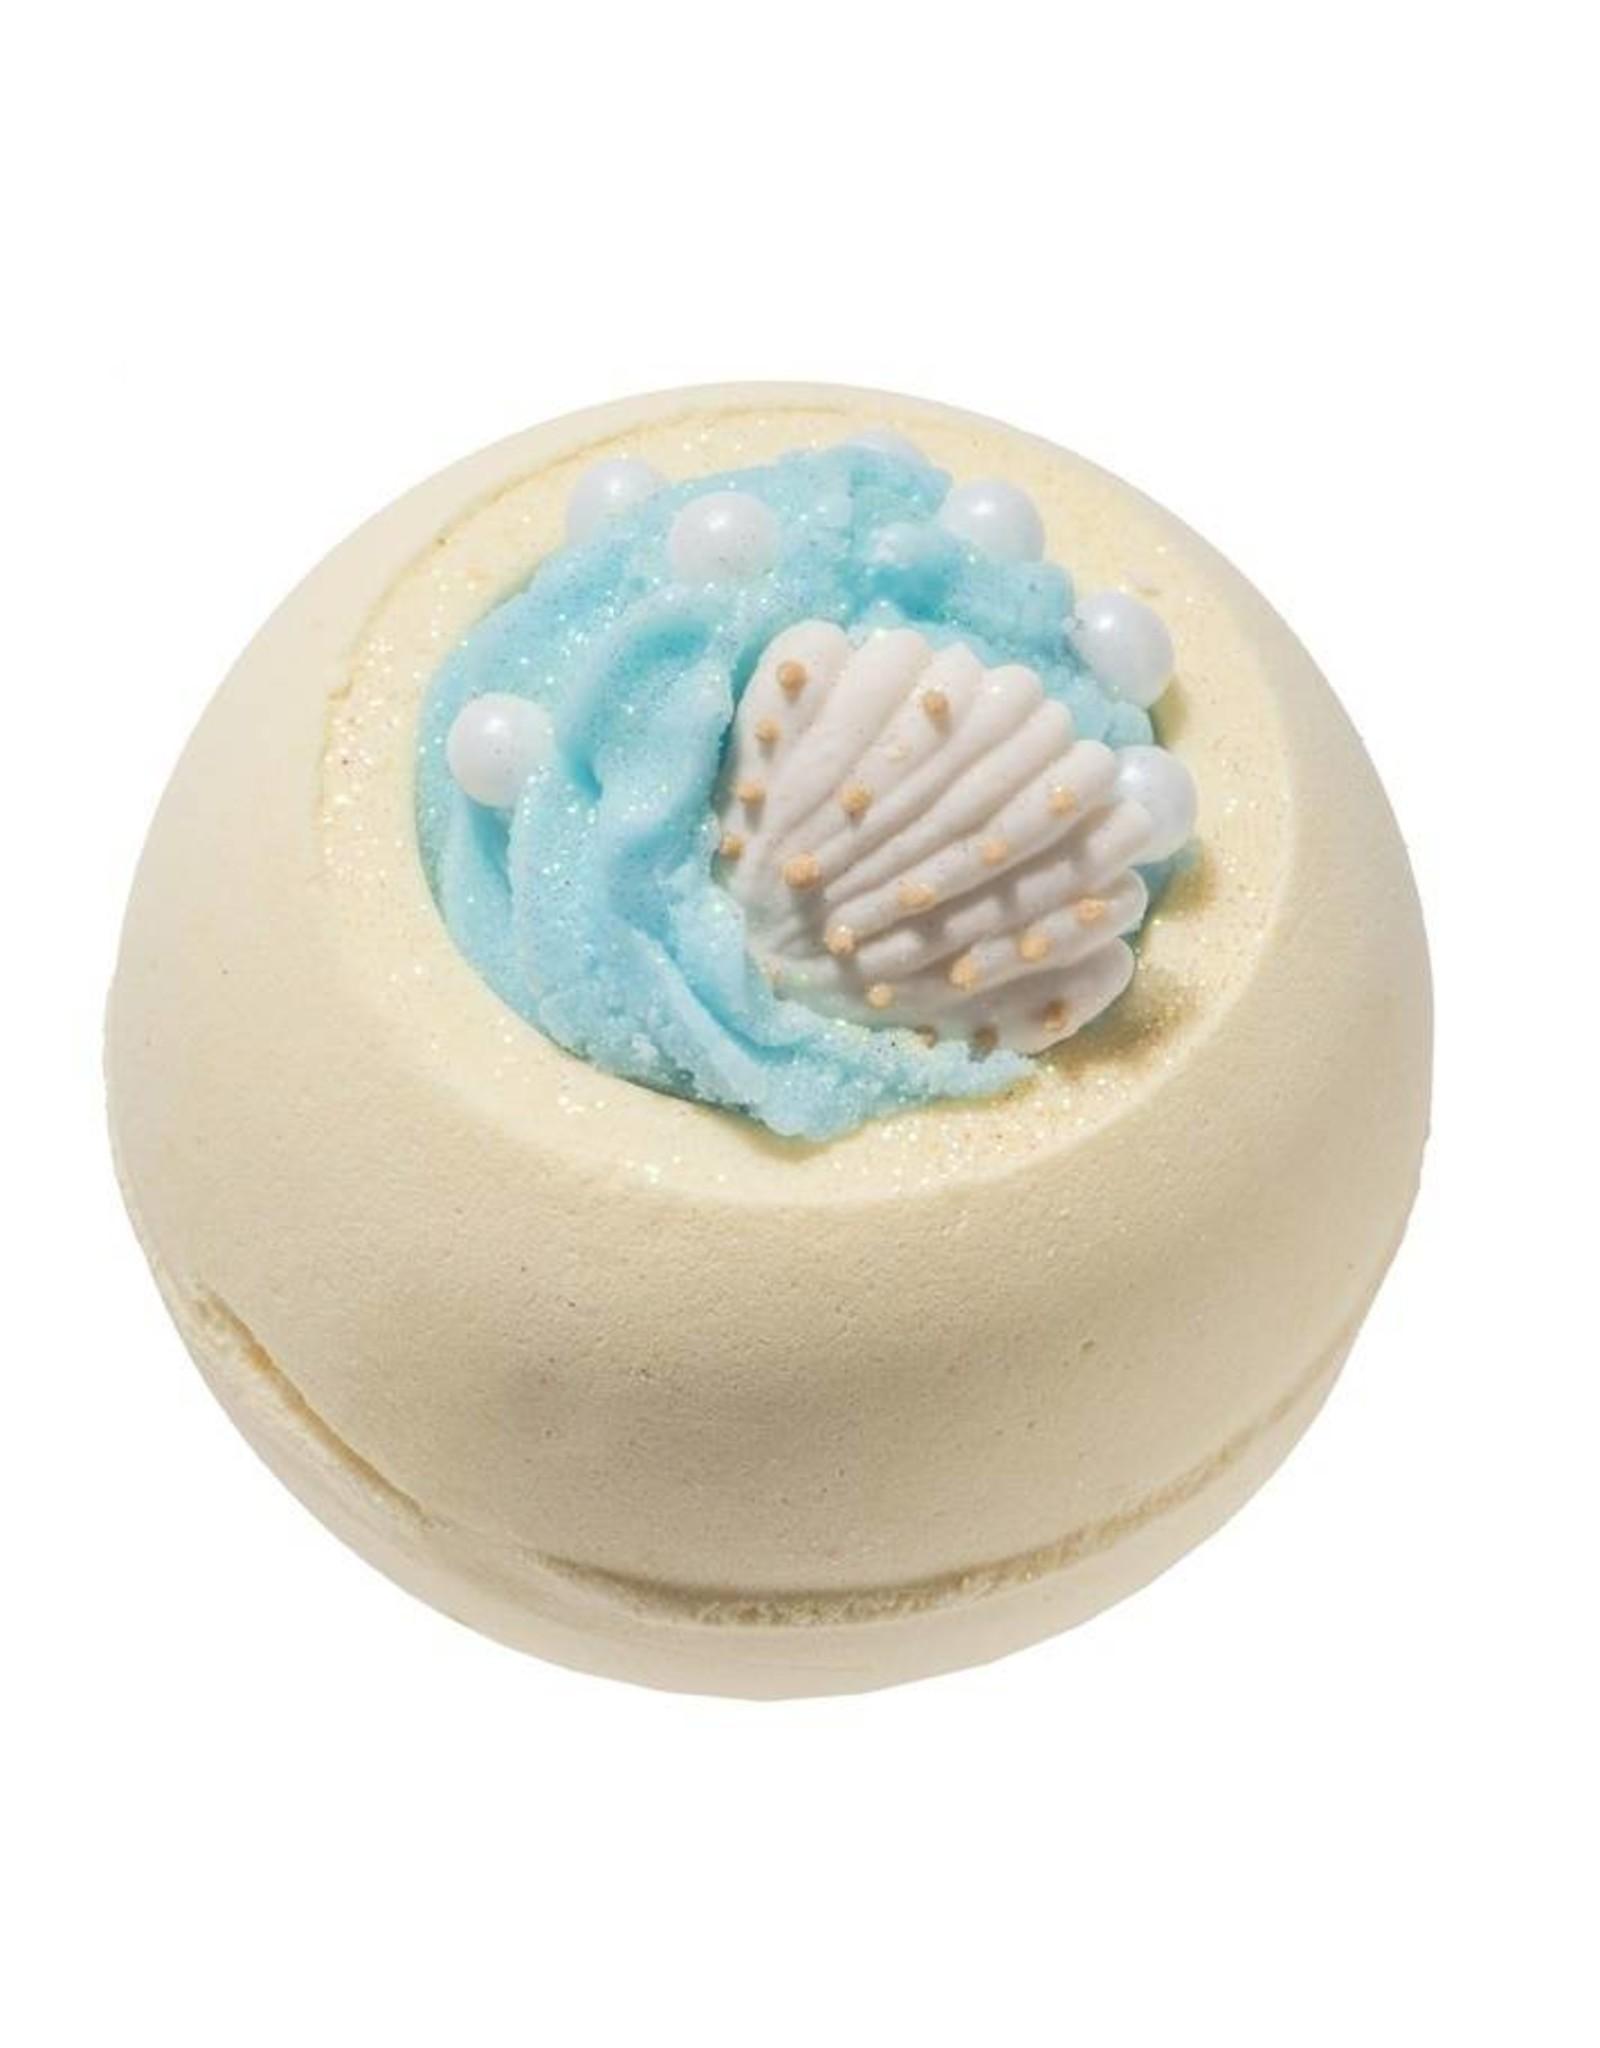 Bomb Cosmetics Bath Blaster 'Mermaids Delight' - Body & Soap